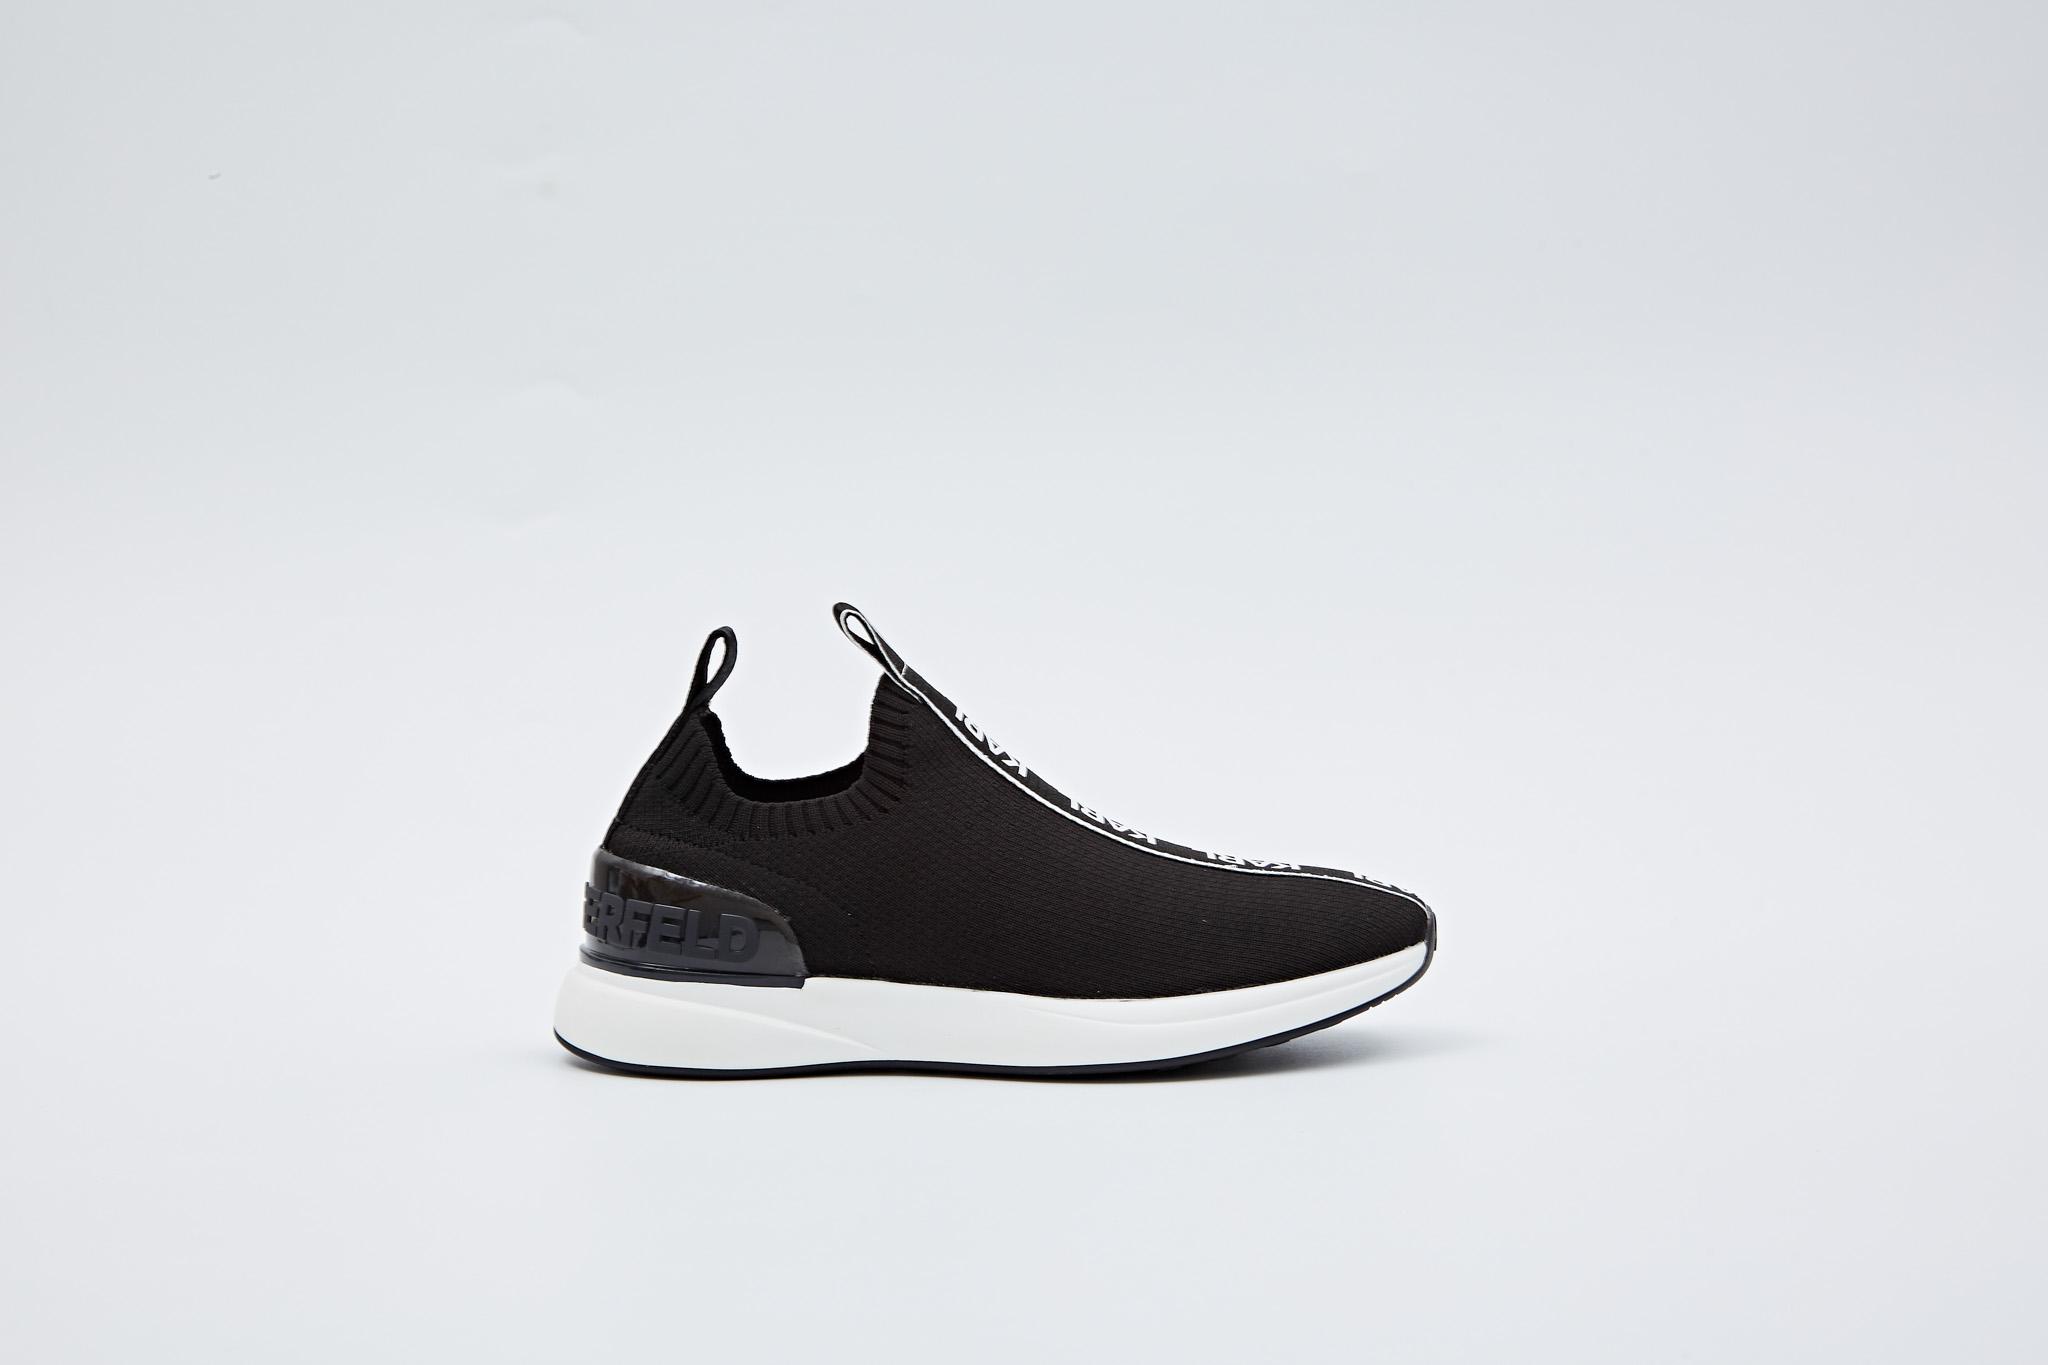 Karl Lagerfeld KL62115 sneakers, black knit textile, 36